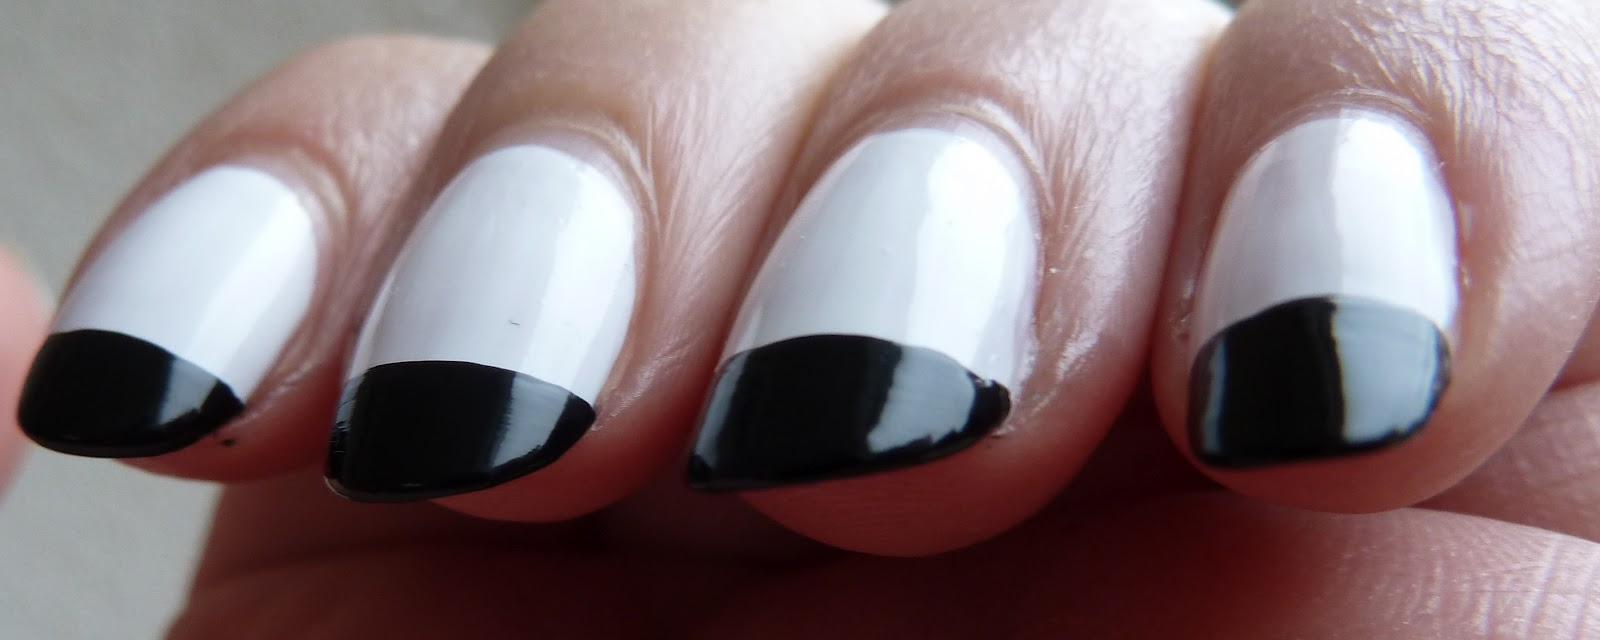 NailsByStephanie: Day #7 Black and White